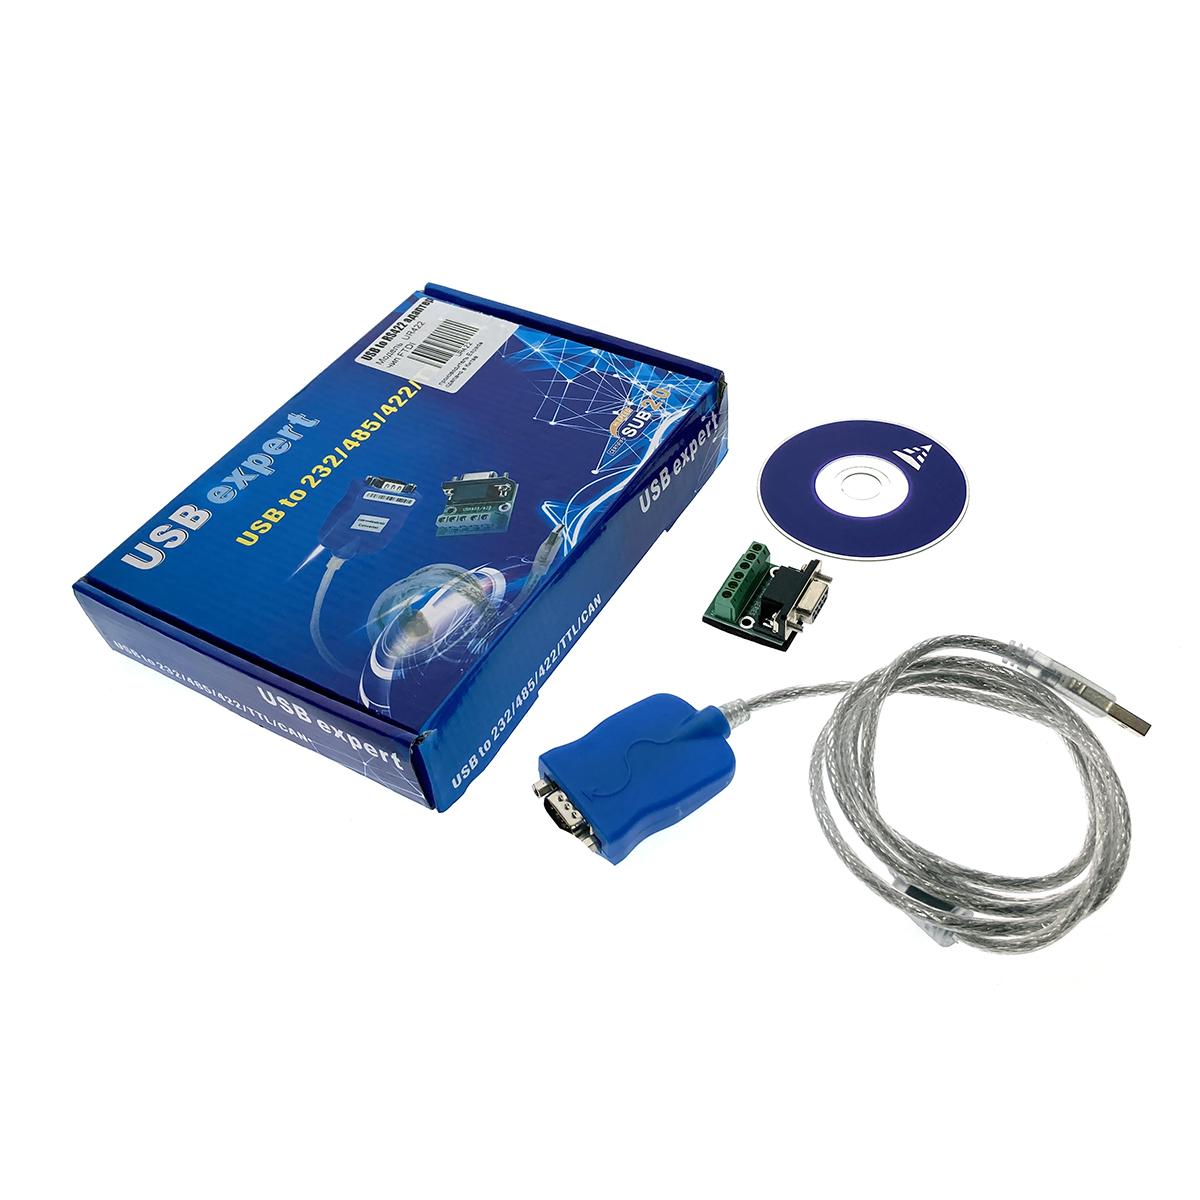 USB to RS422 адаптер, модель UR422, Espada